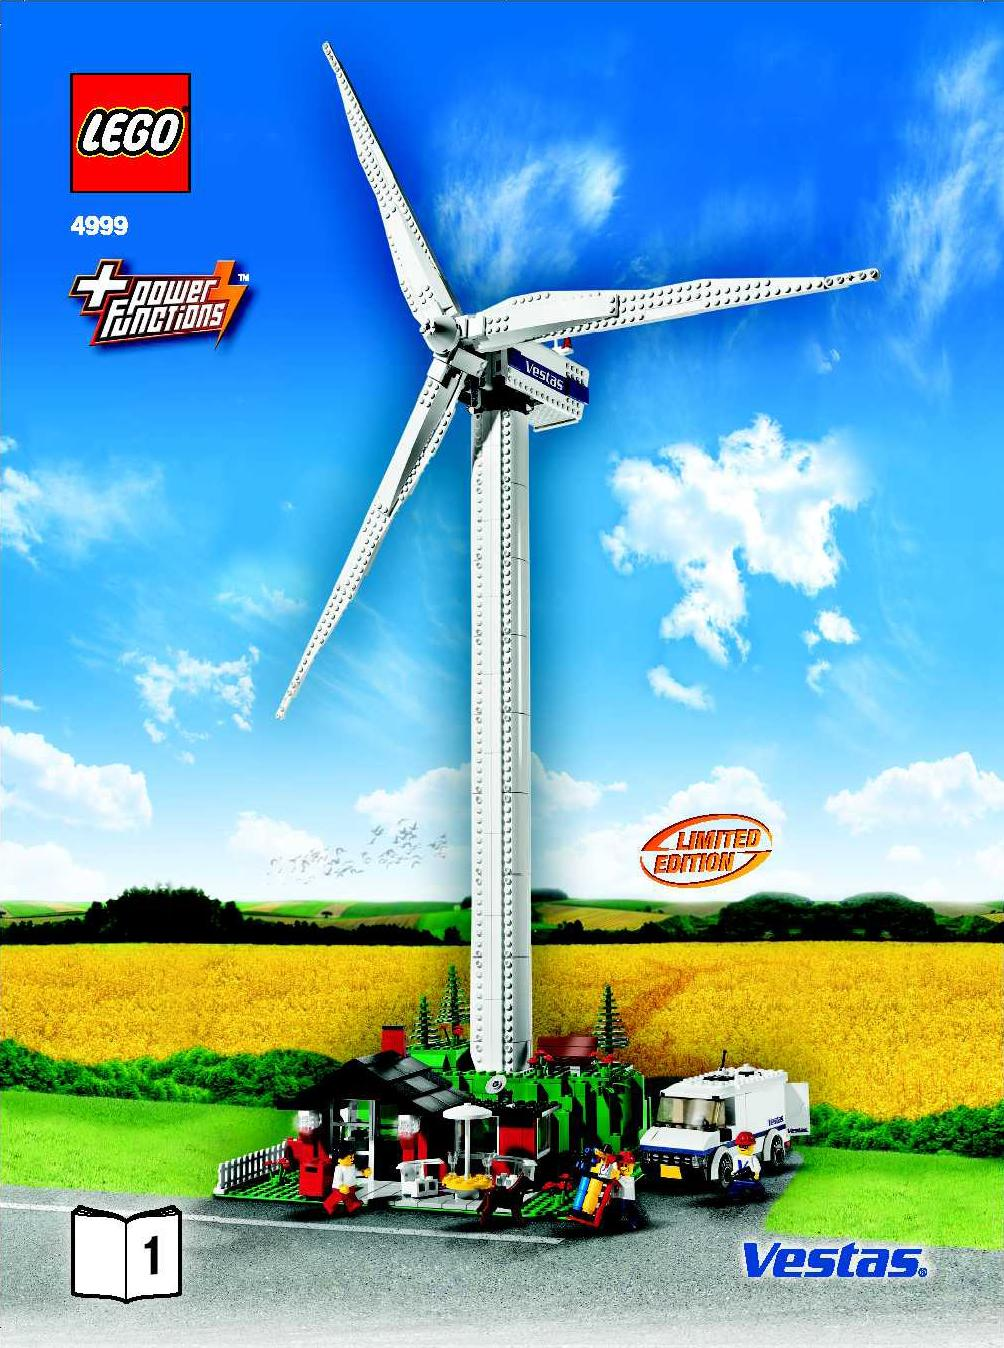 Wind farms construction · LEGO Vestas 4999 Power Functions Windmill